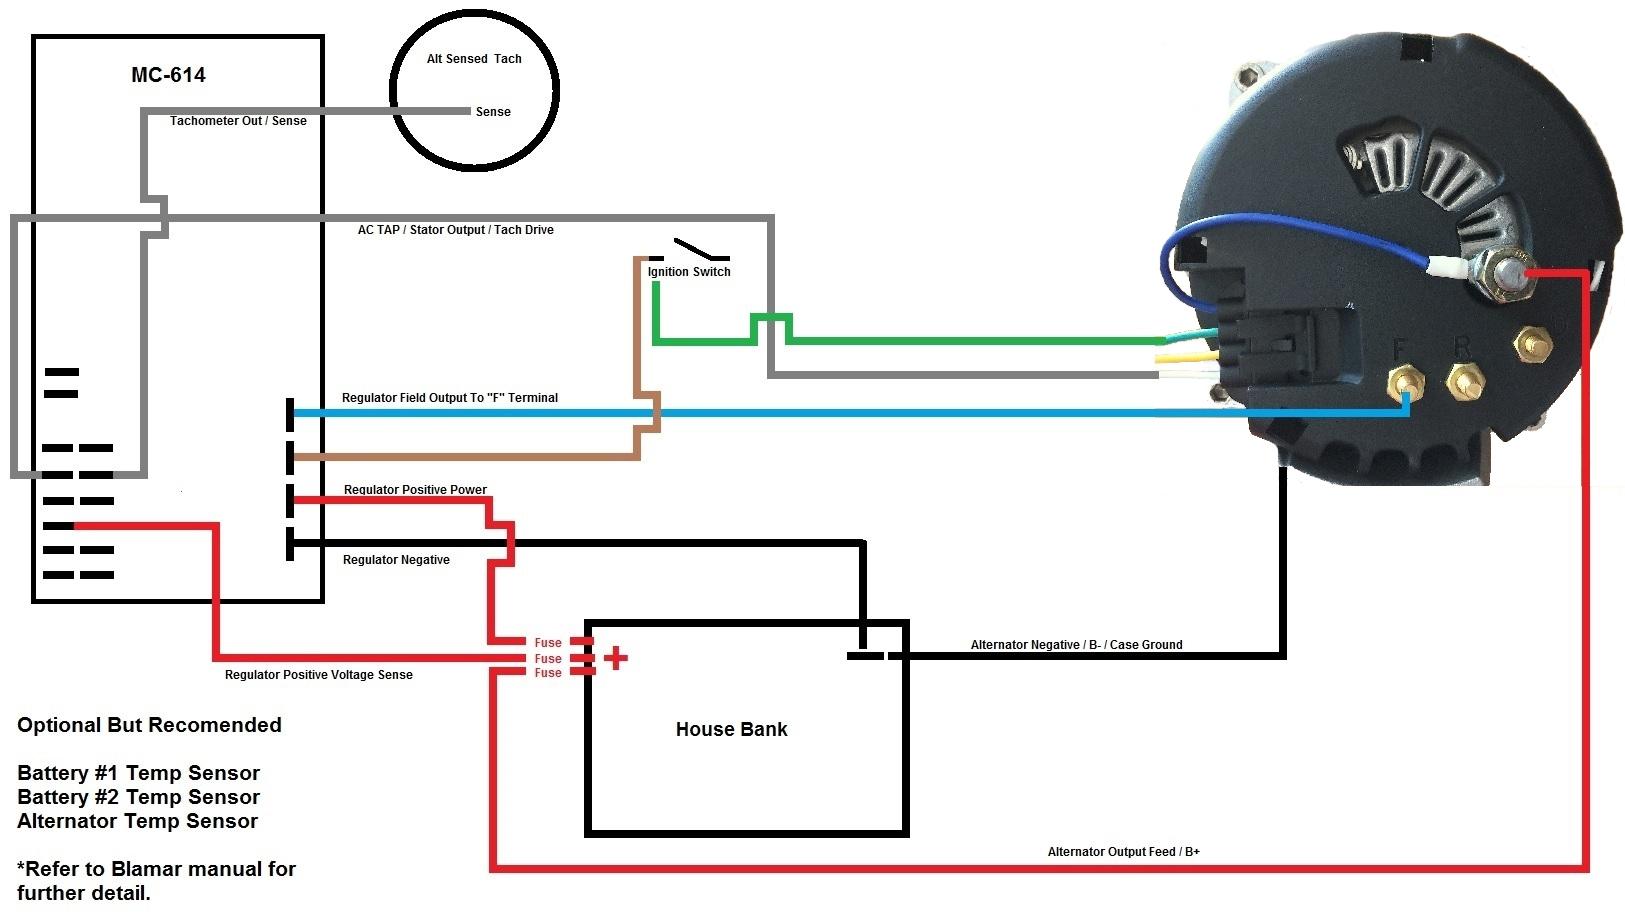 Balmar alternator wiring diagram radio wiring diagram balmar alternator wiring diagram free download wiring diagram rh xwiaw us 12 volt alternator regulator battery asfbconference2016 Gallery